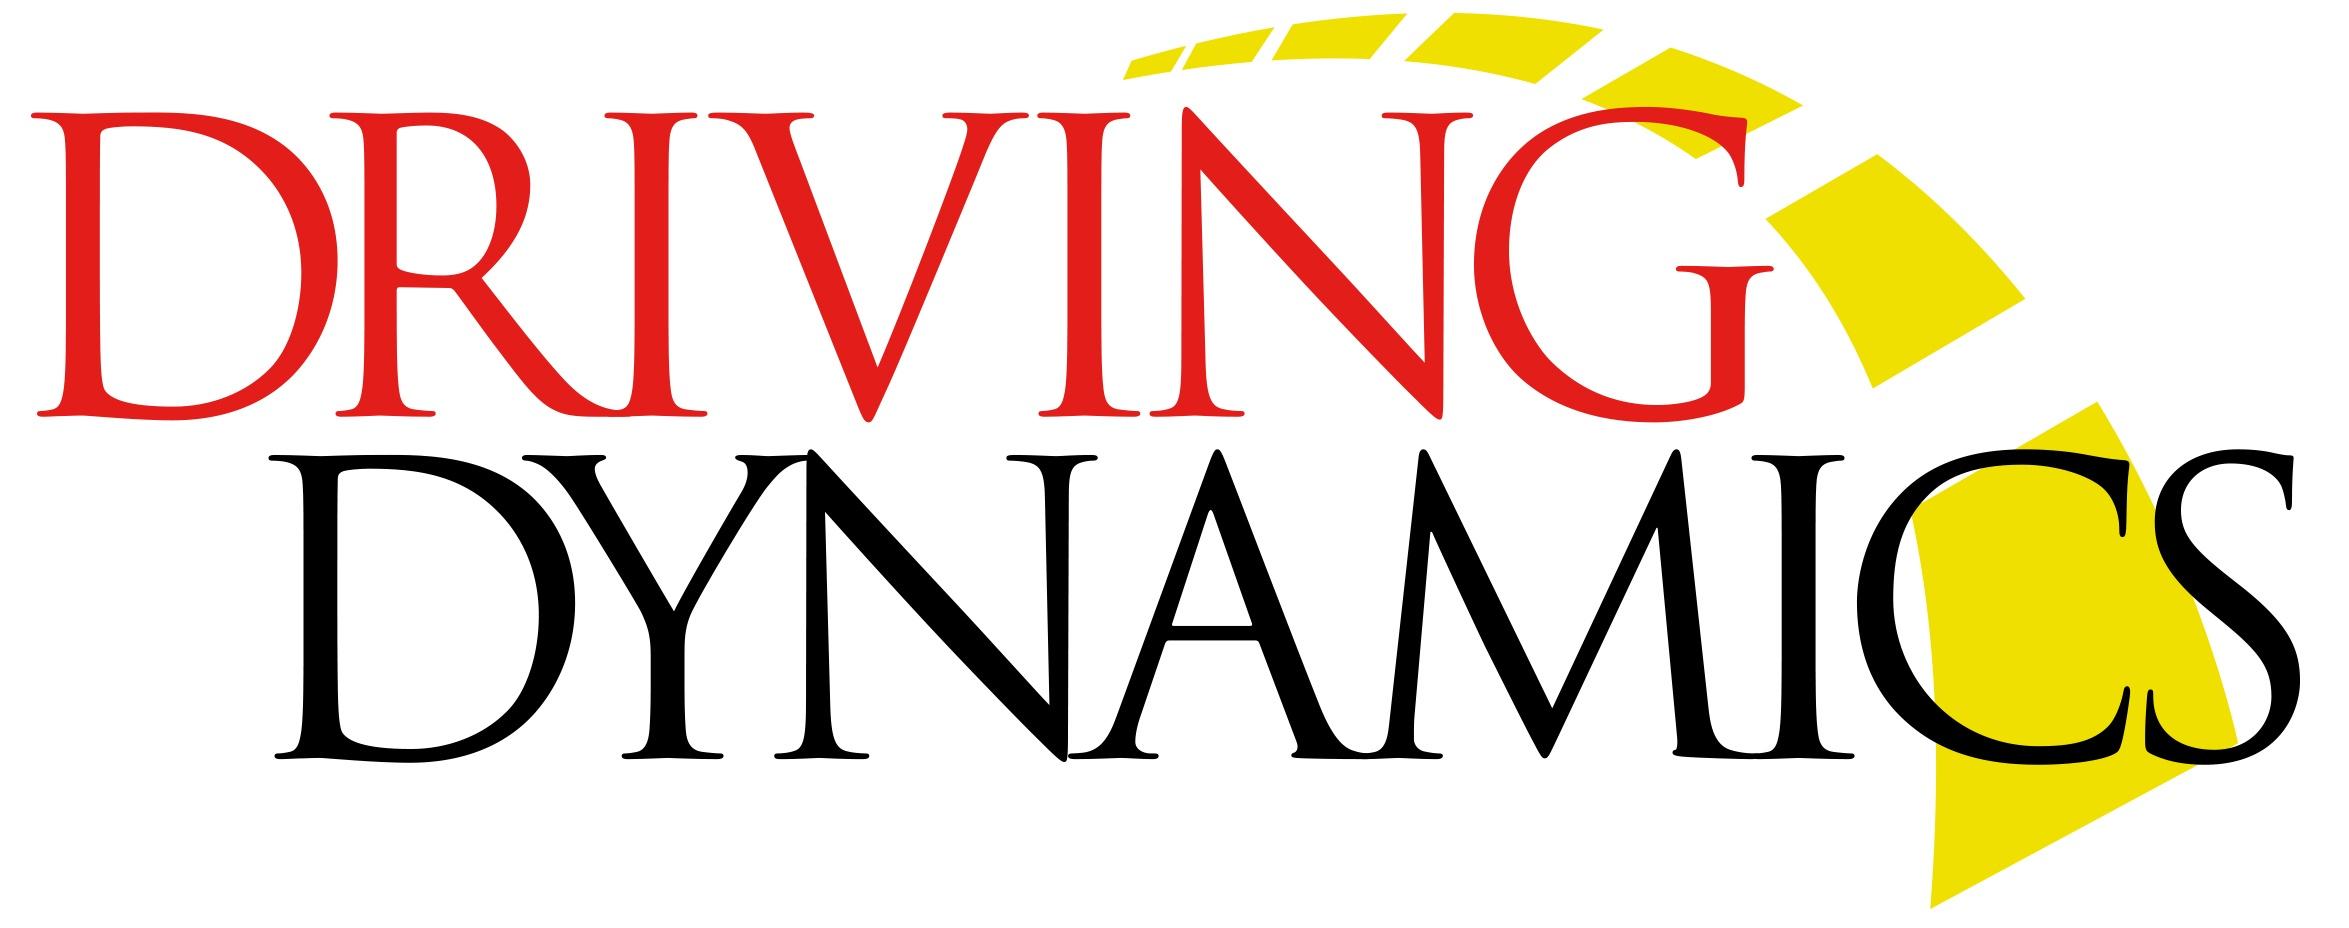 DD Updated logo.jpg